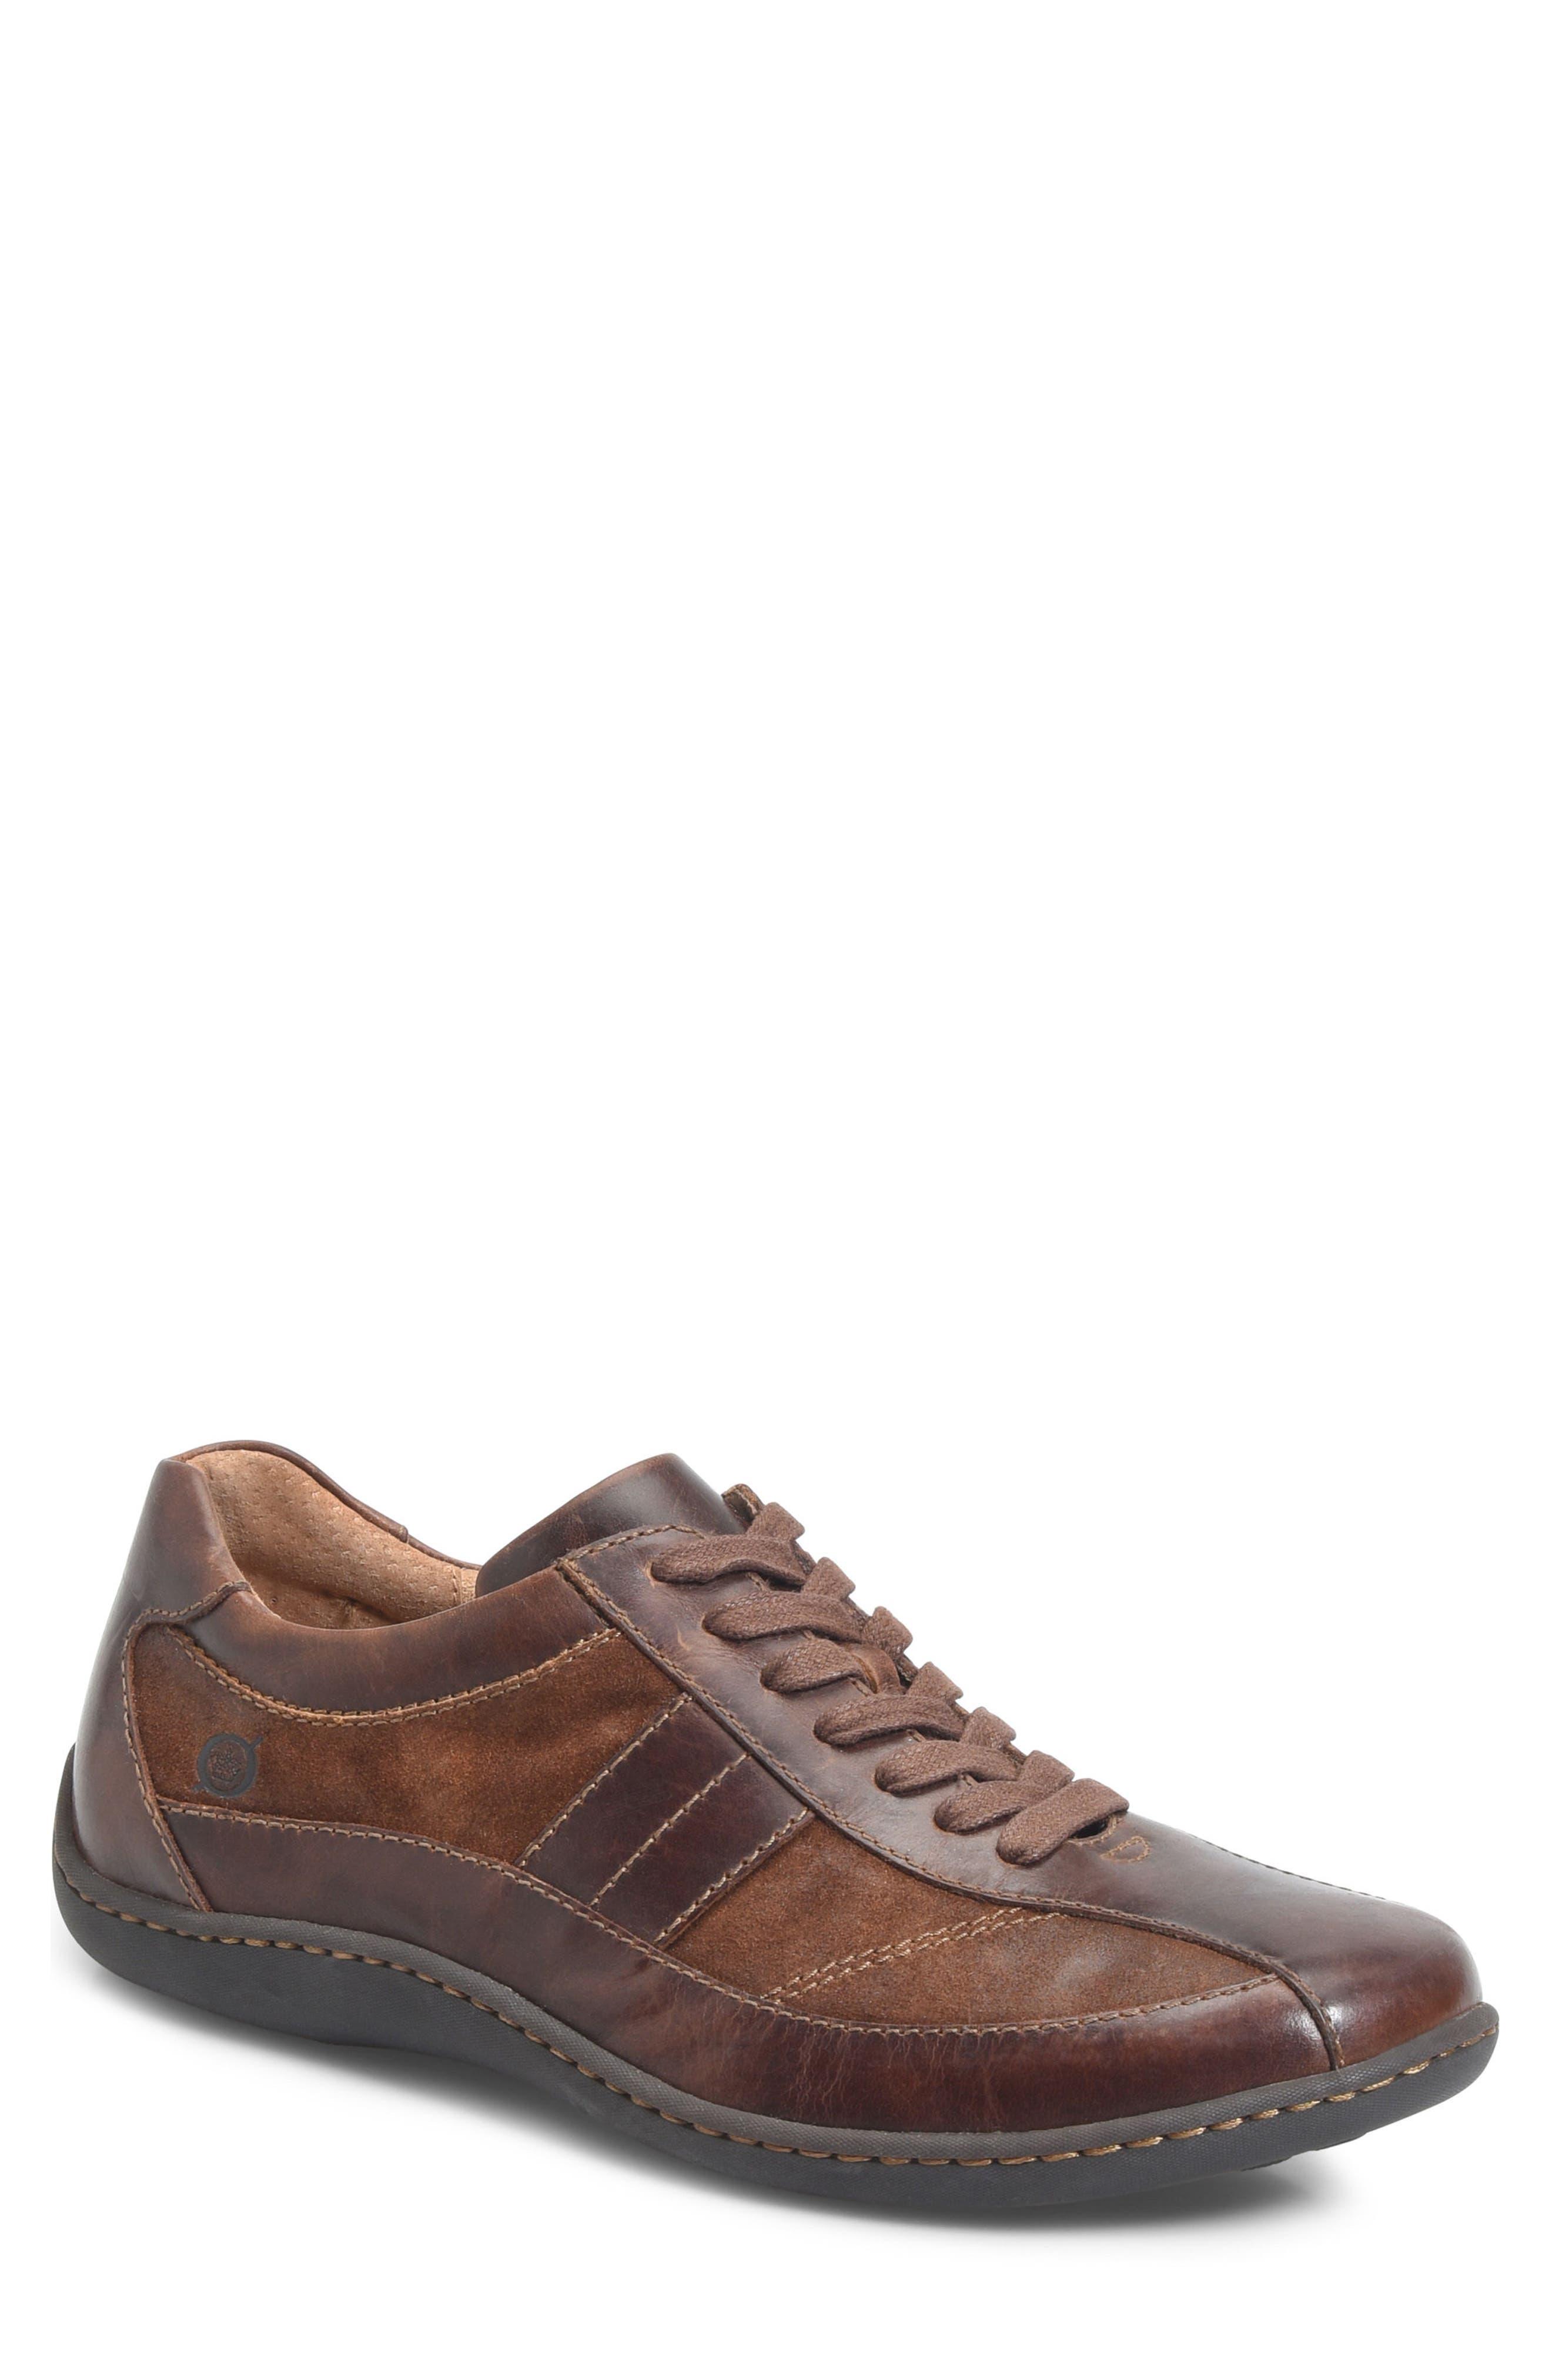 BØRN Breves Low Top Sneaker, Main, color, 230